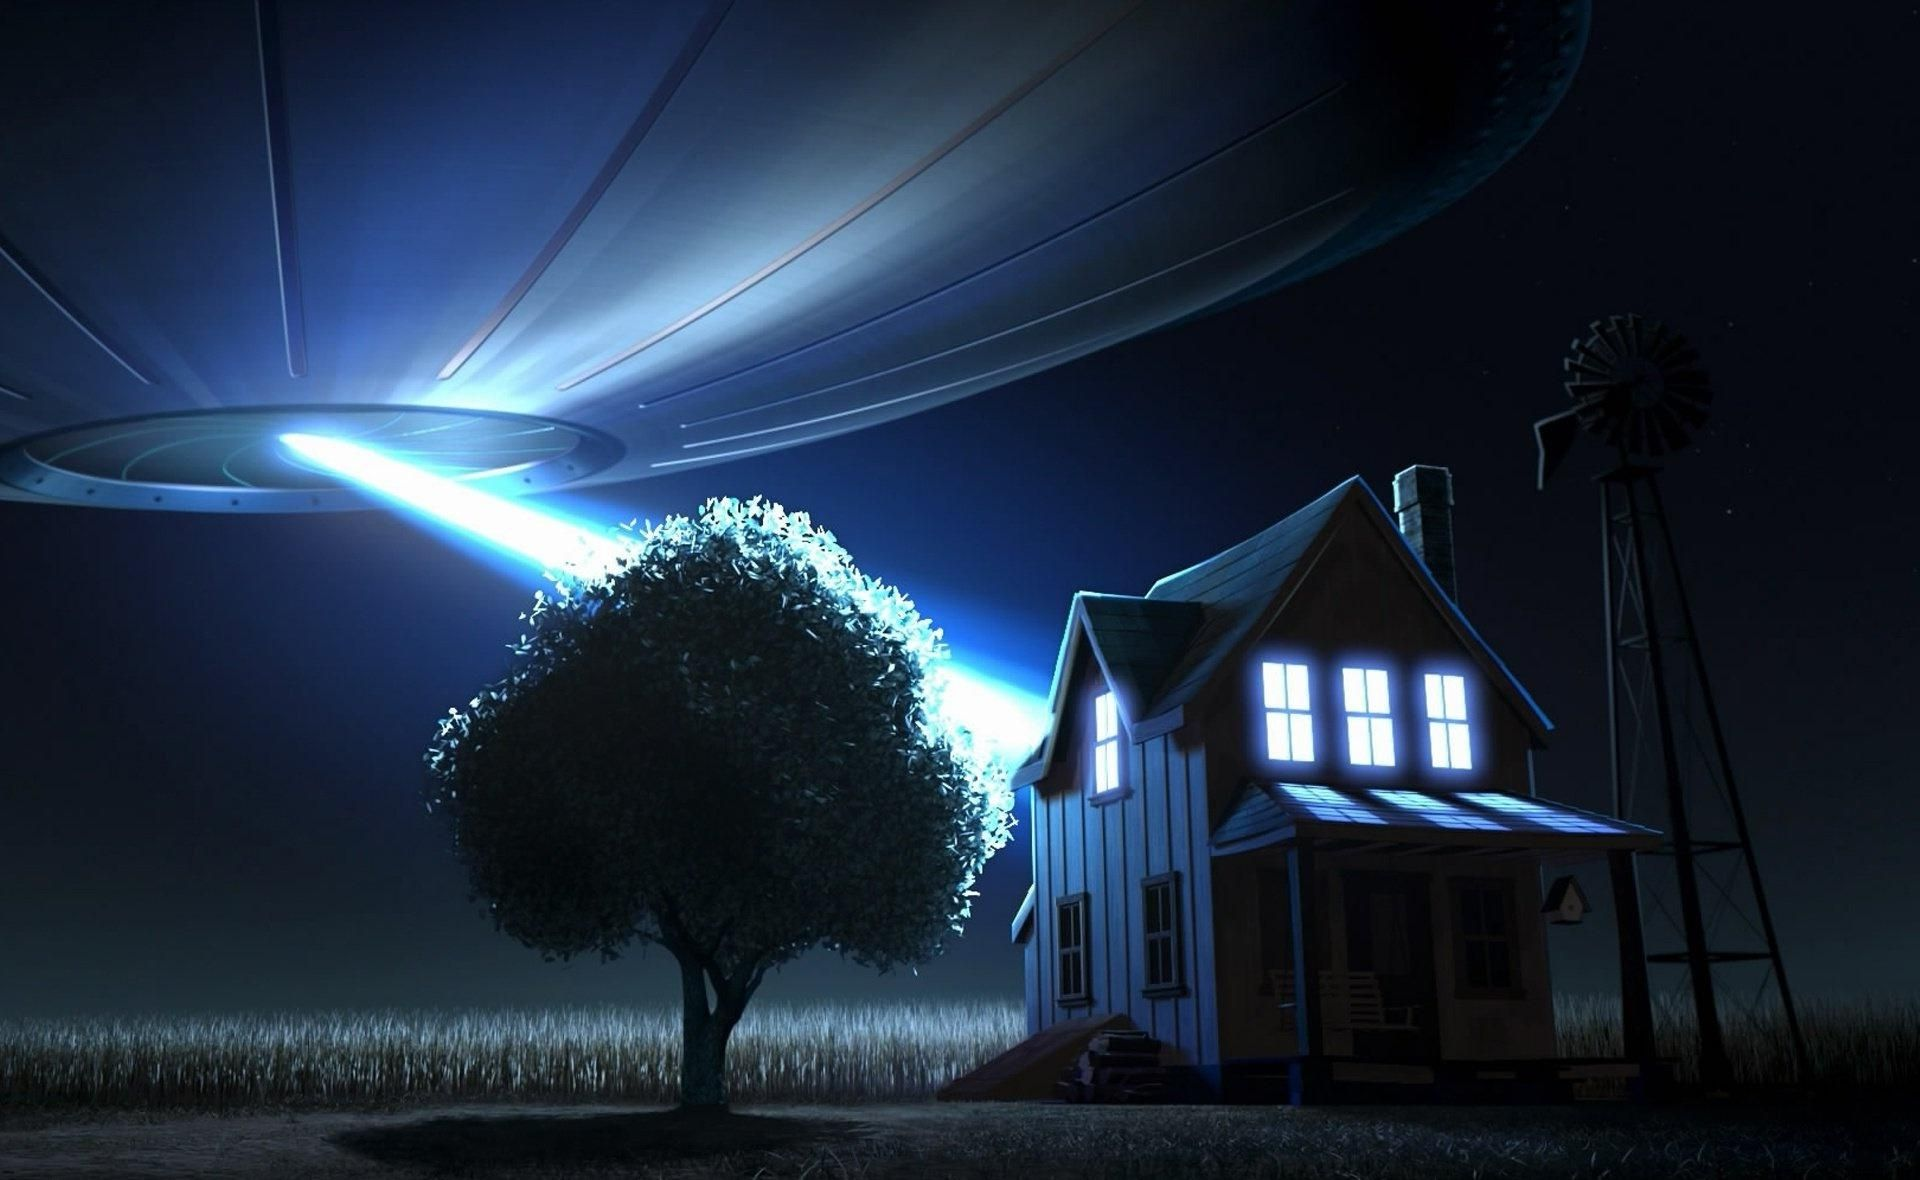 UFO dream meaning, dream about UFO, UFO dream interpretation, seeing in a dream UFO